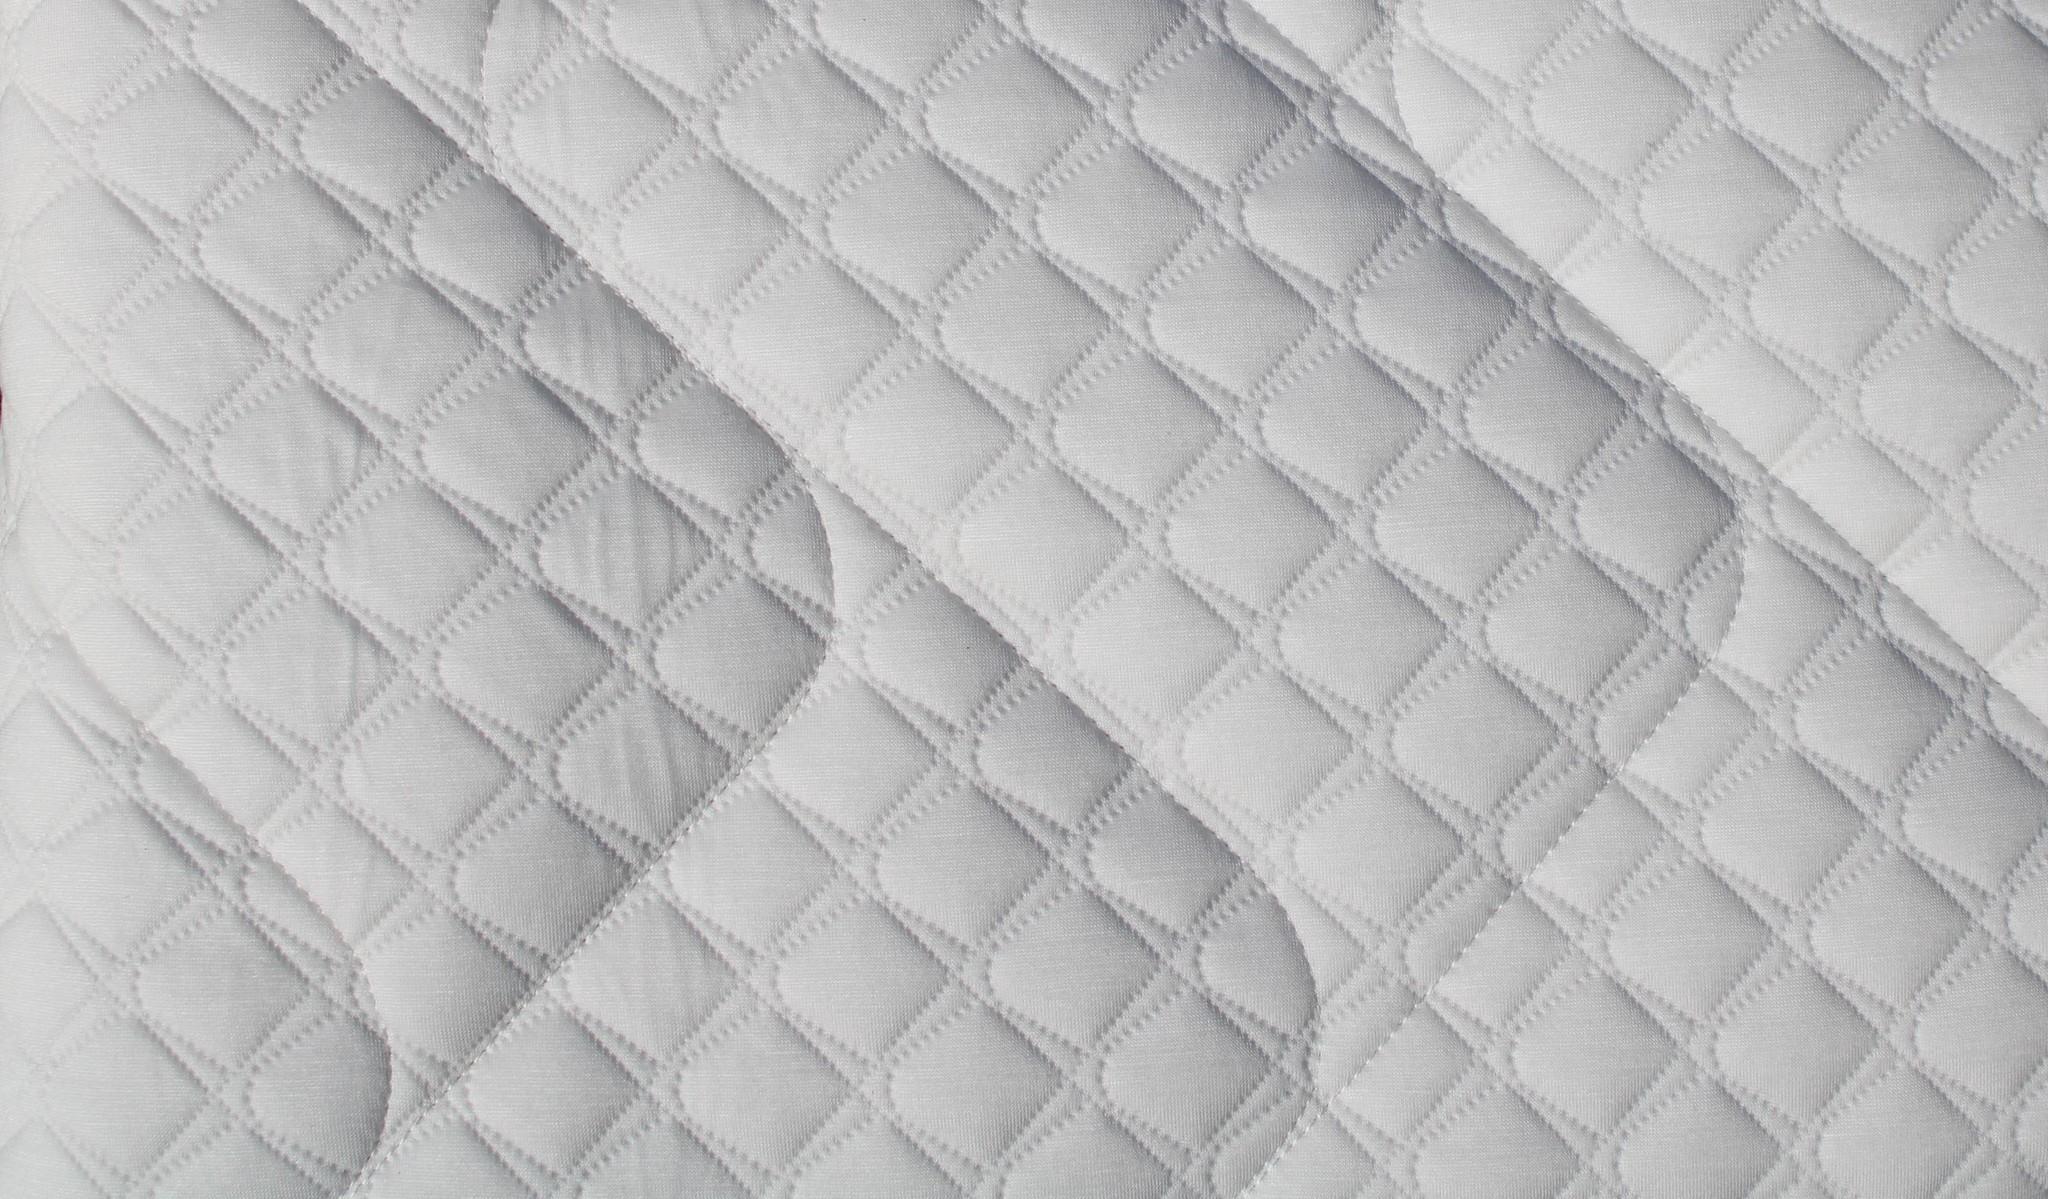 Sarpy Kindermatras 80x150 Sertel Tailor Made Mattress